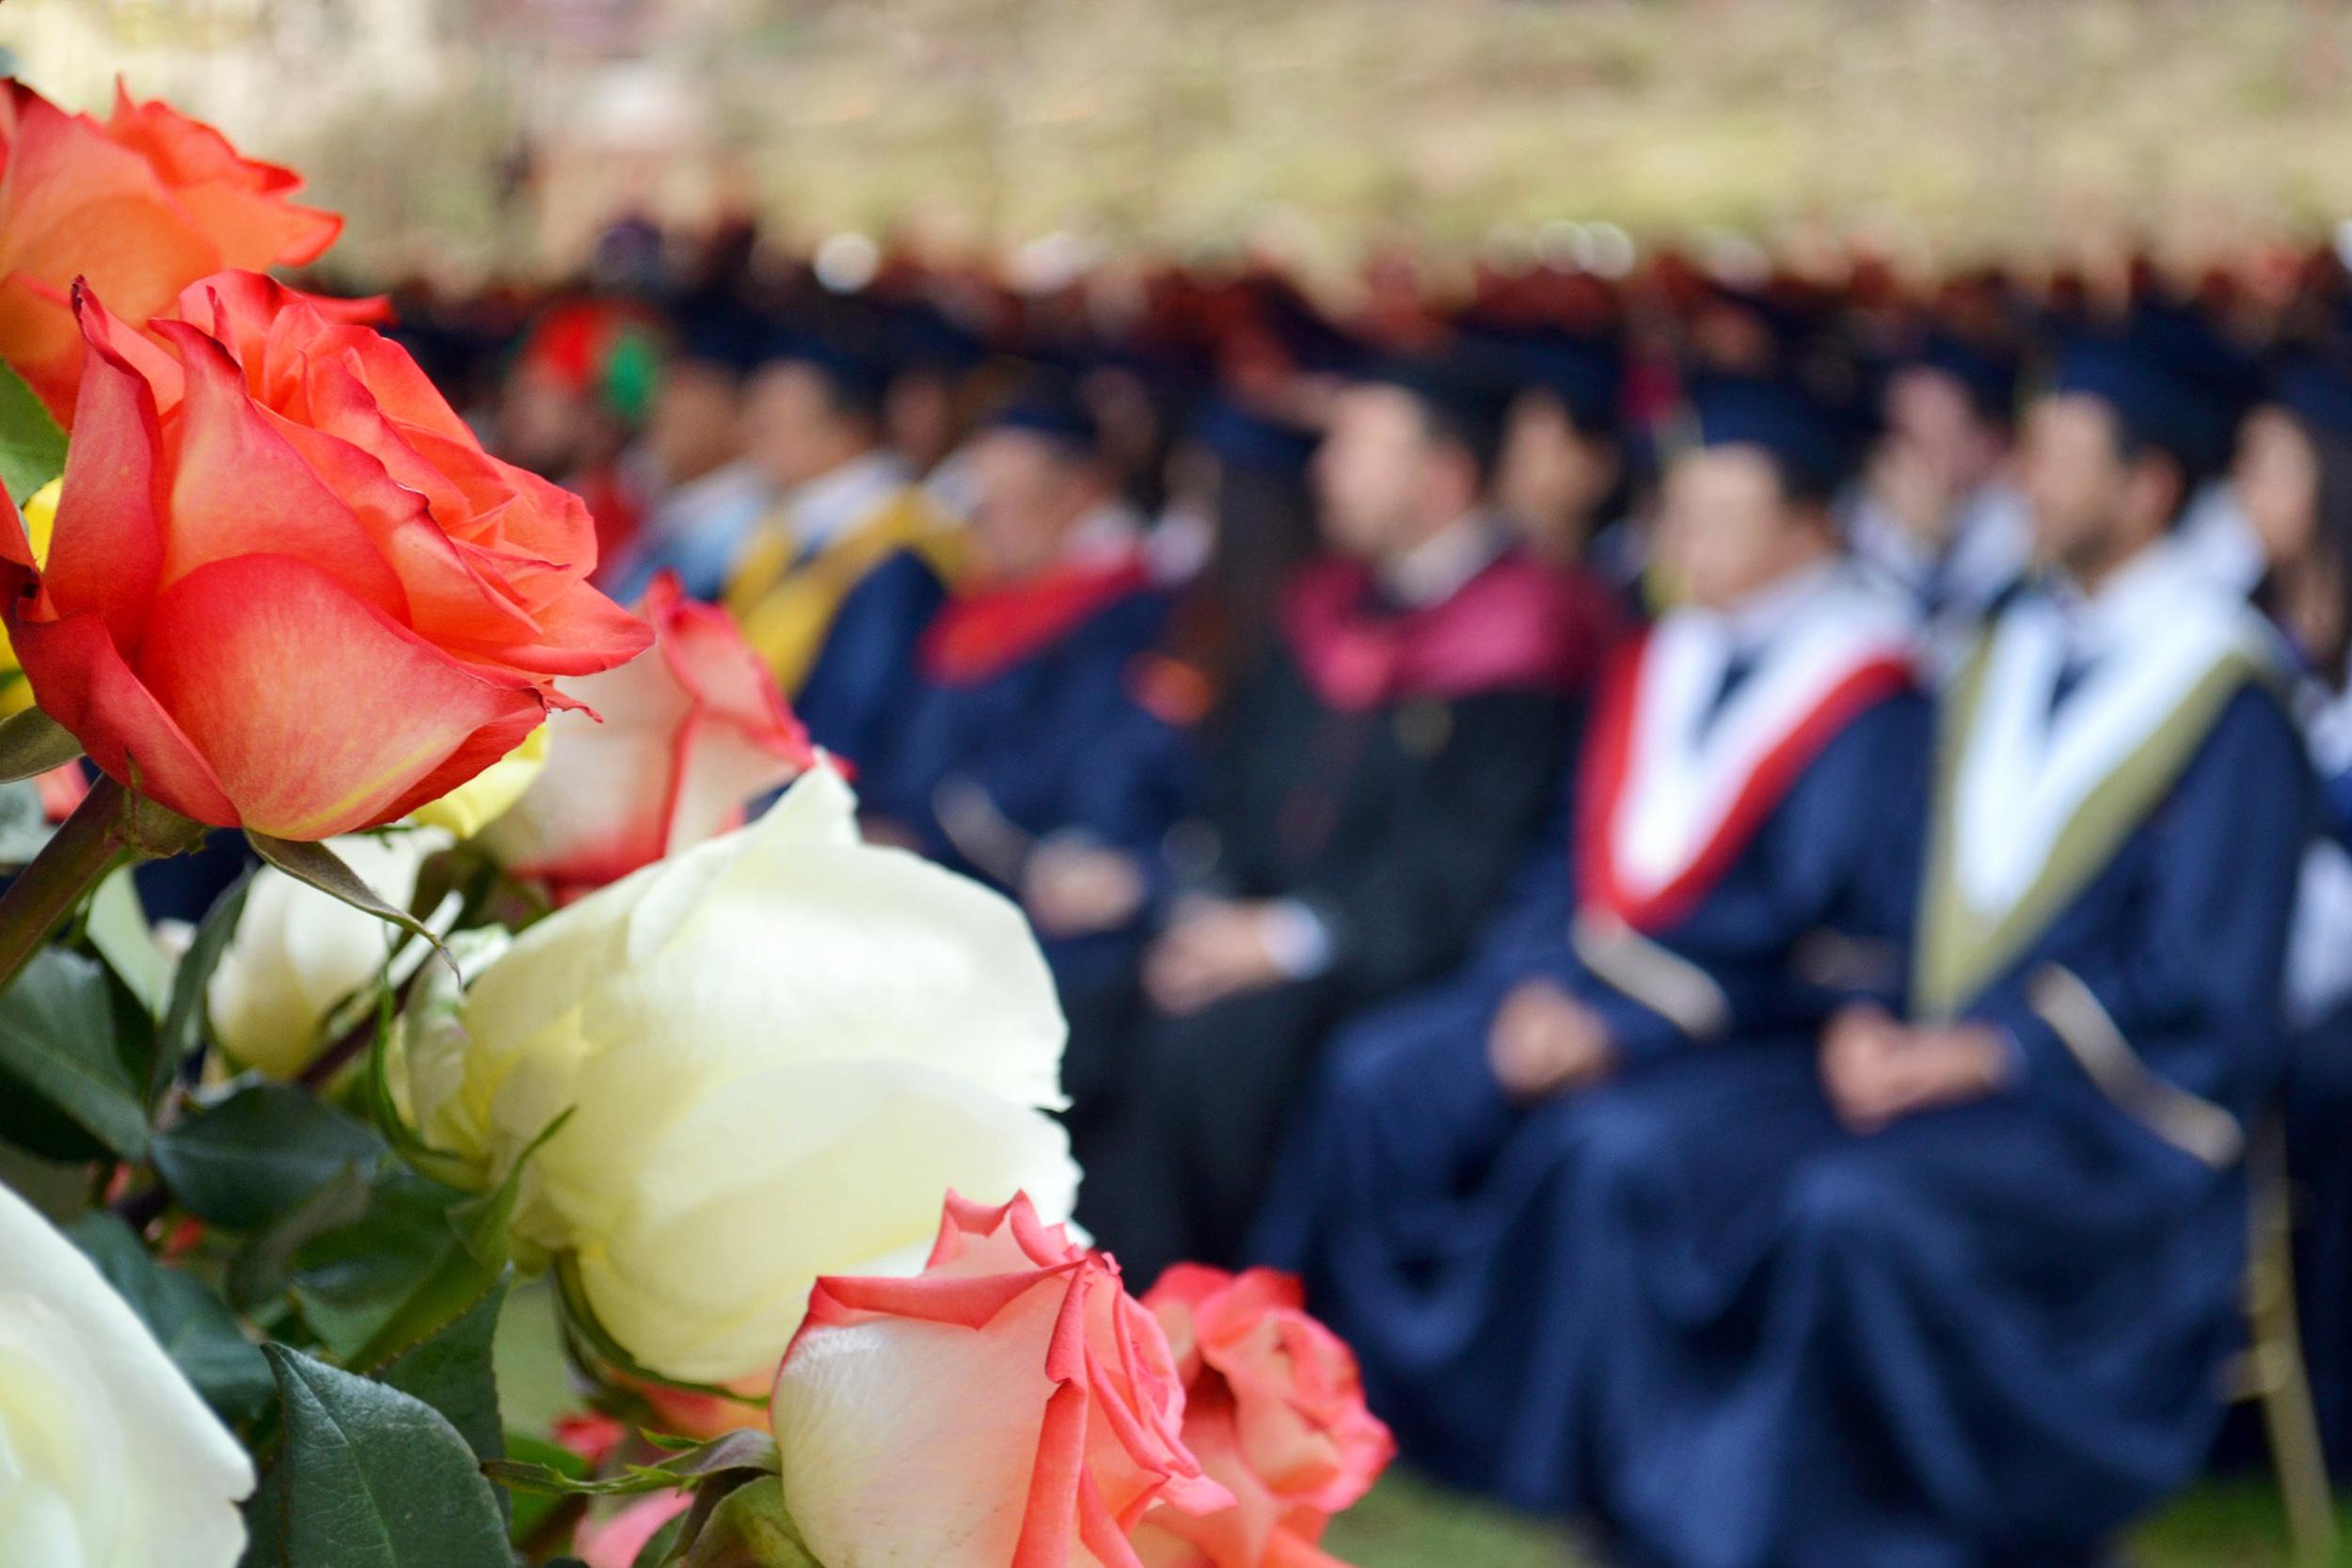 London Graduation Photography - audience